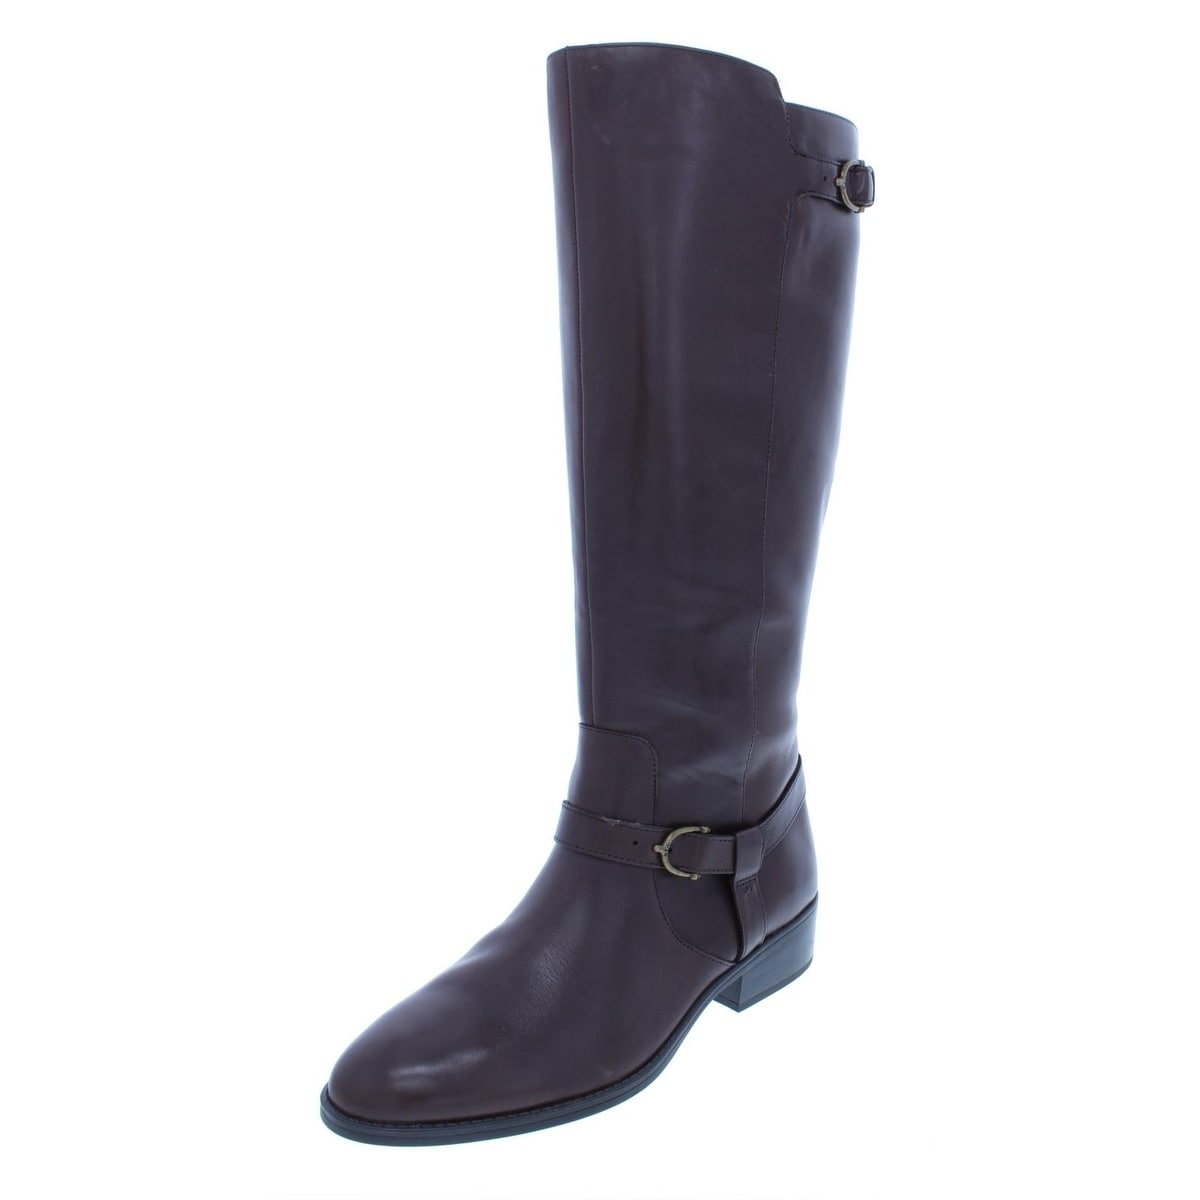 59596f16416 Shop Lauren Ralph Lauren Womens Margarite Riding Boots Leather Wide ...